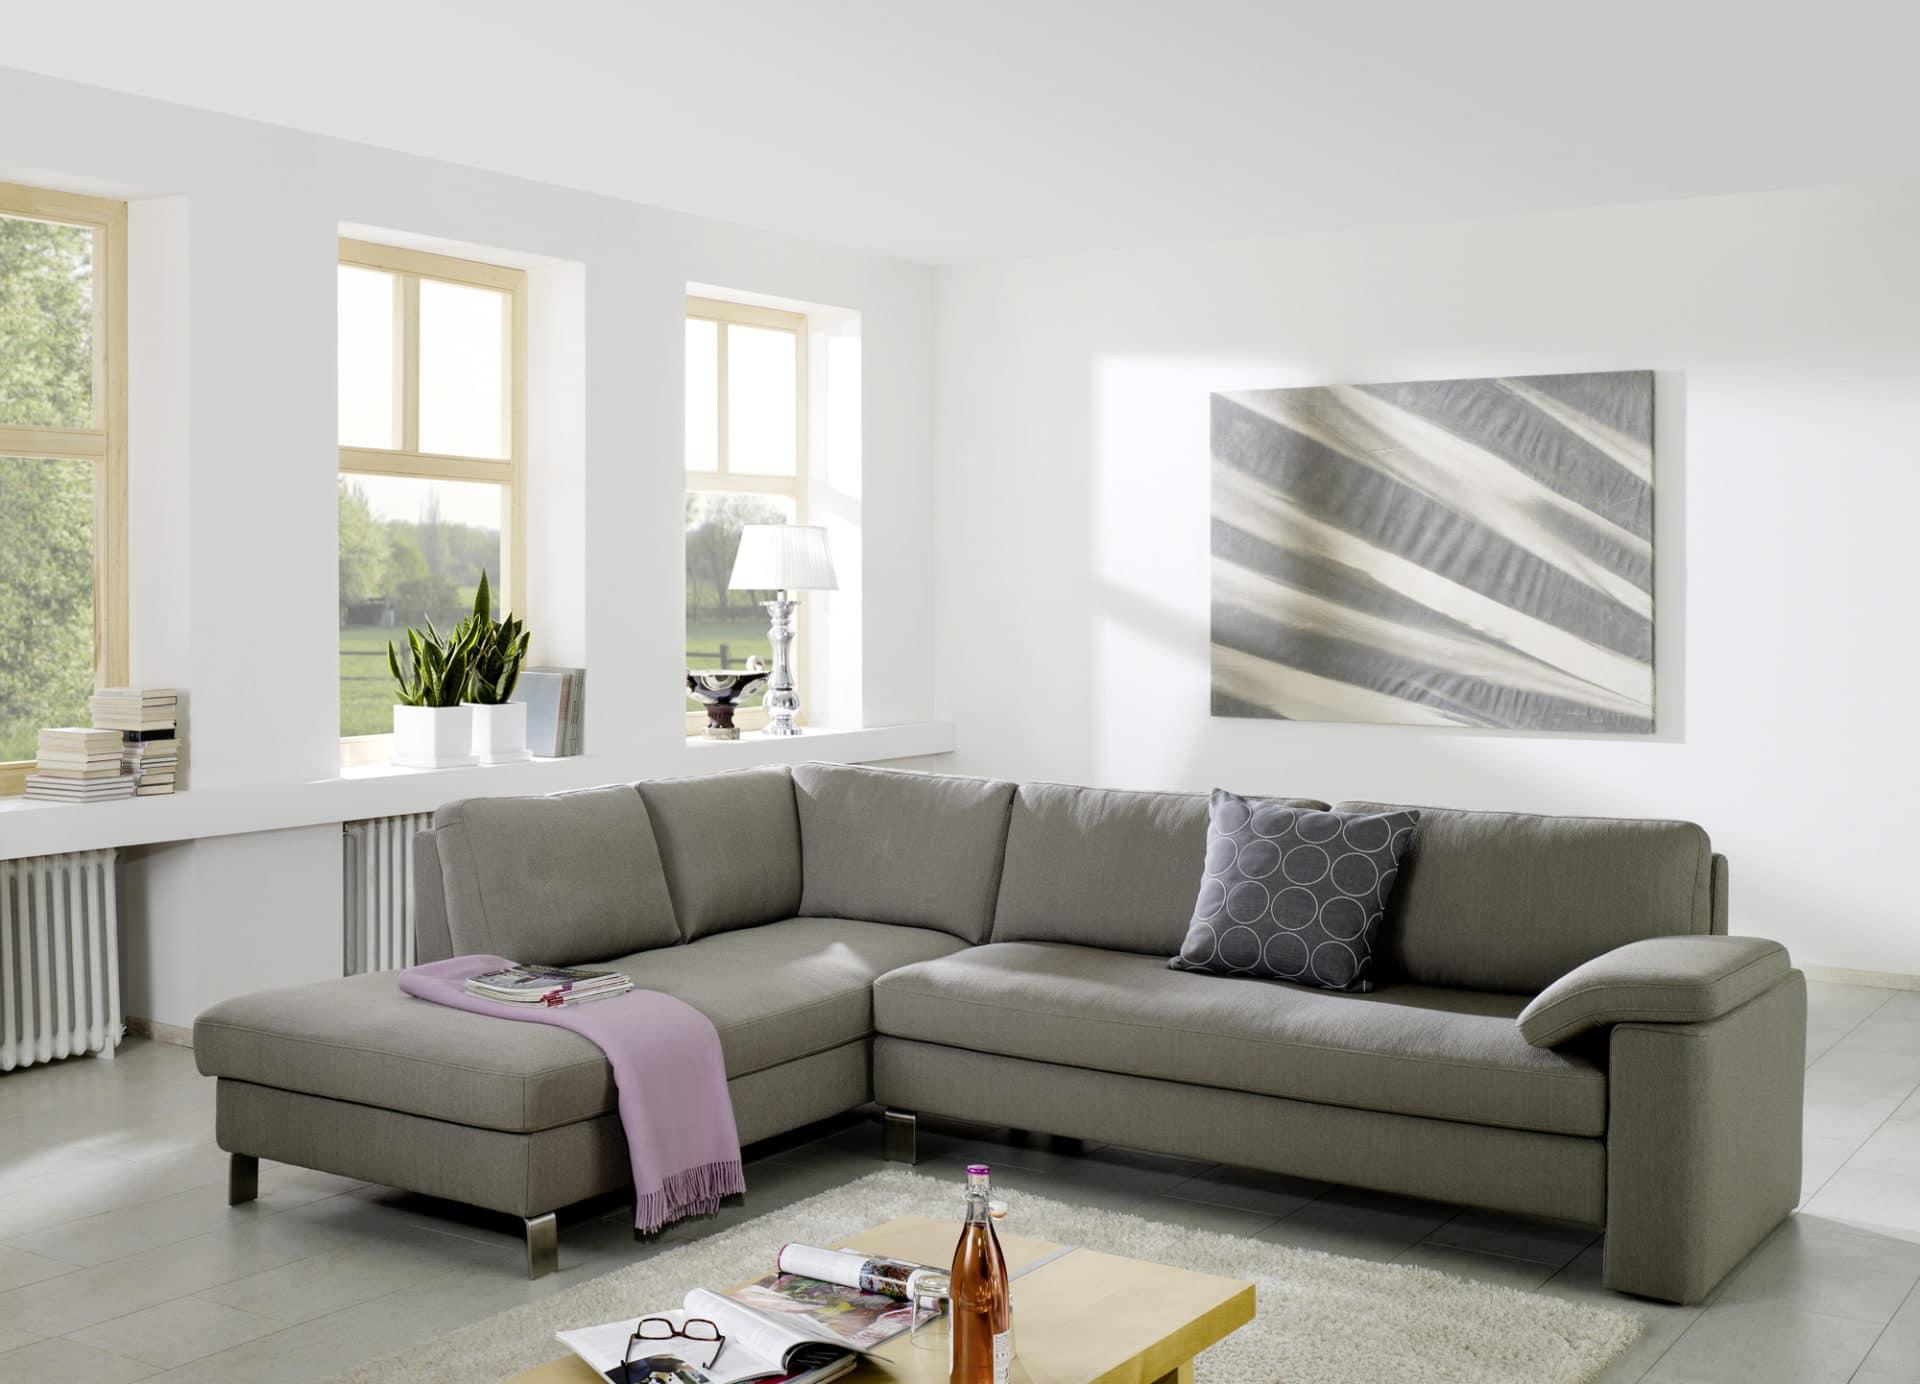 sofasystem siena 2 5 sitzer mit ottomane ko control. Black Bedroom Furniture Sets. Home Design Ideas